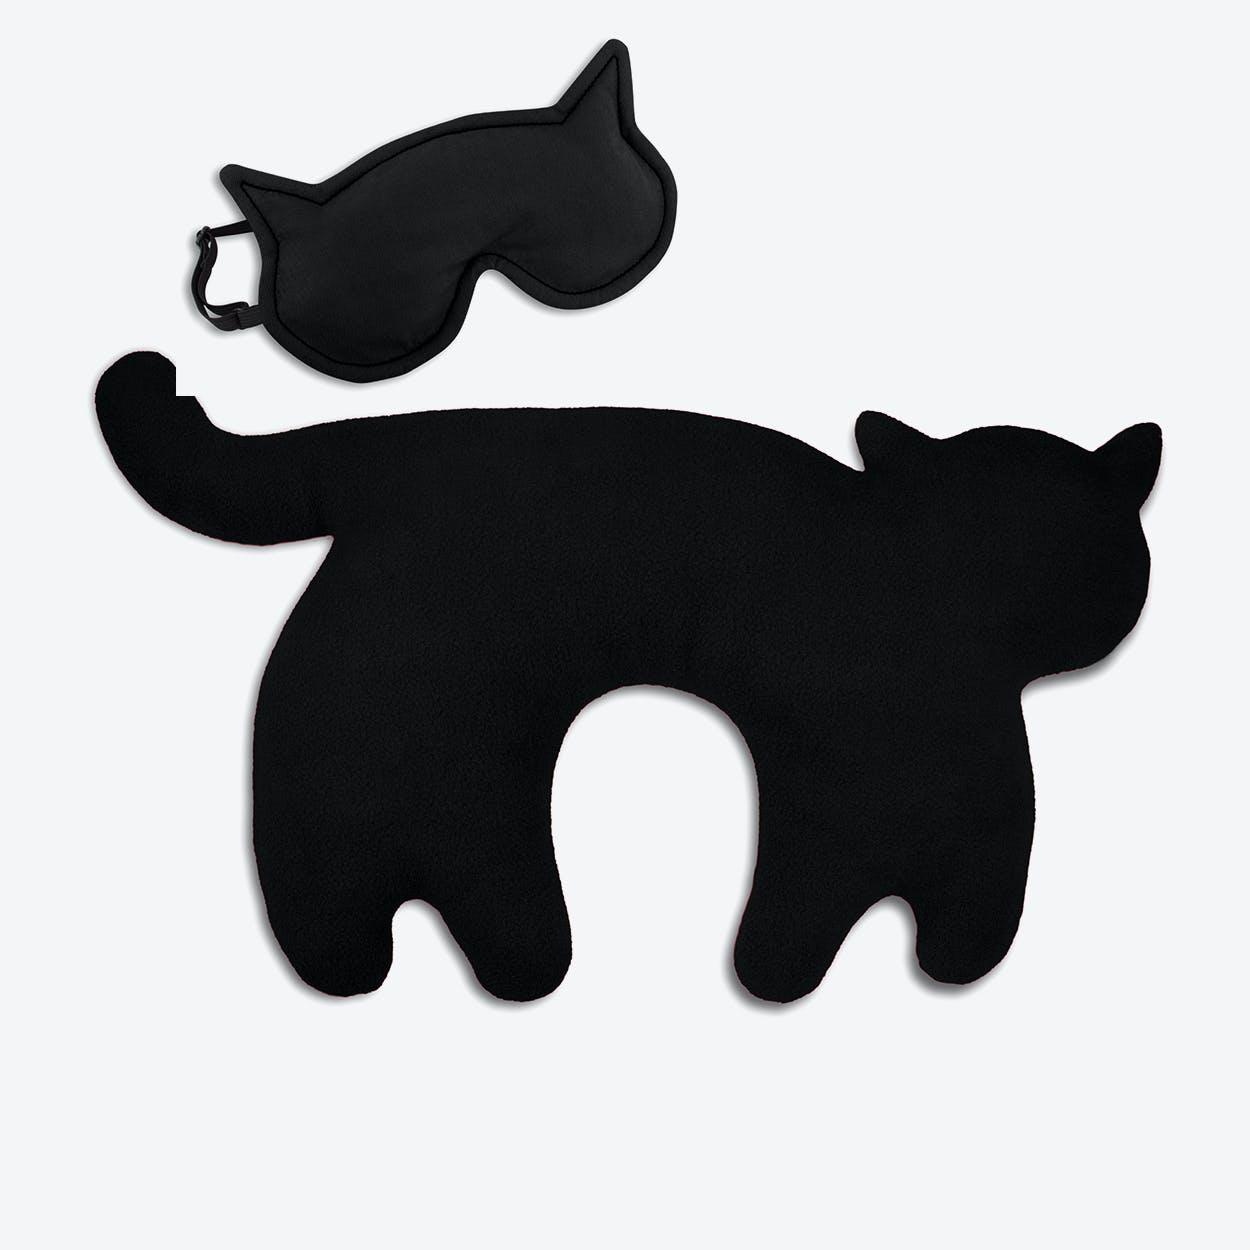 Travel Set of 2-Travel Pillow (Cat in Black/Black) & Eye Mask (Cat in Black/Black)